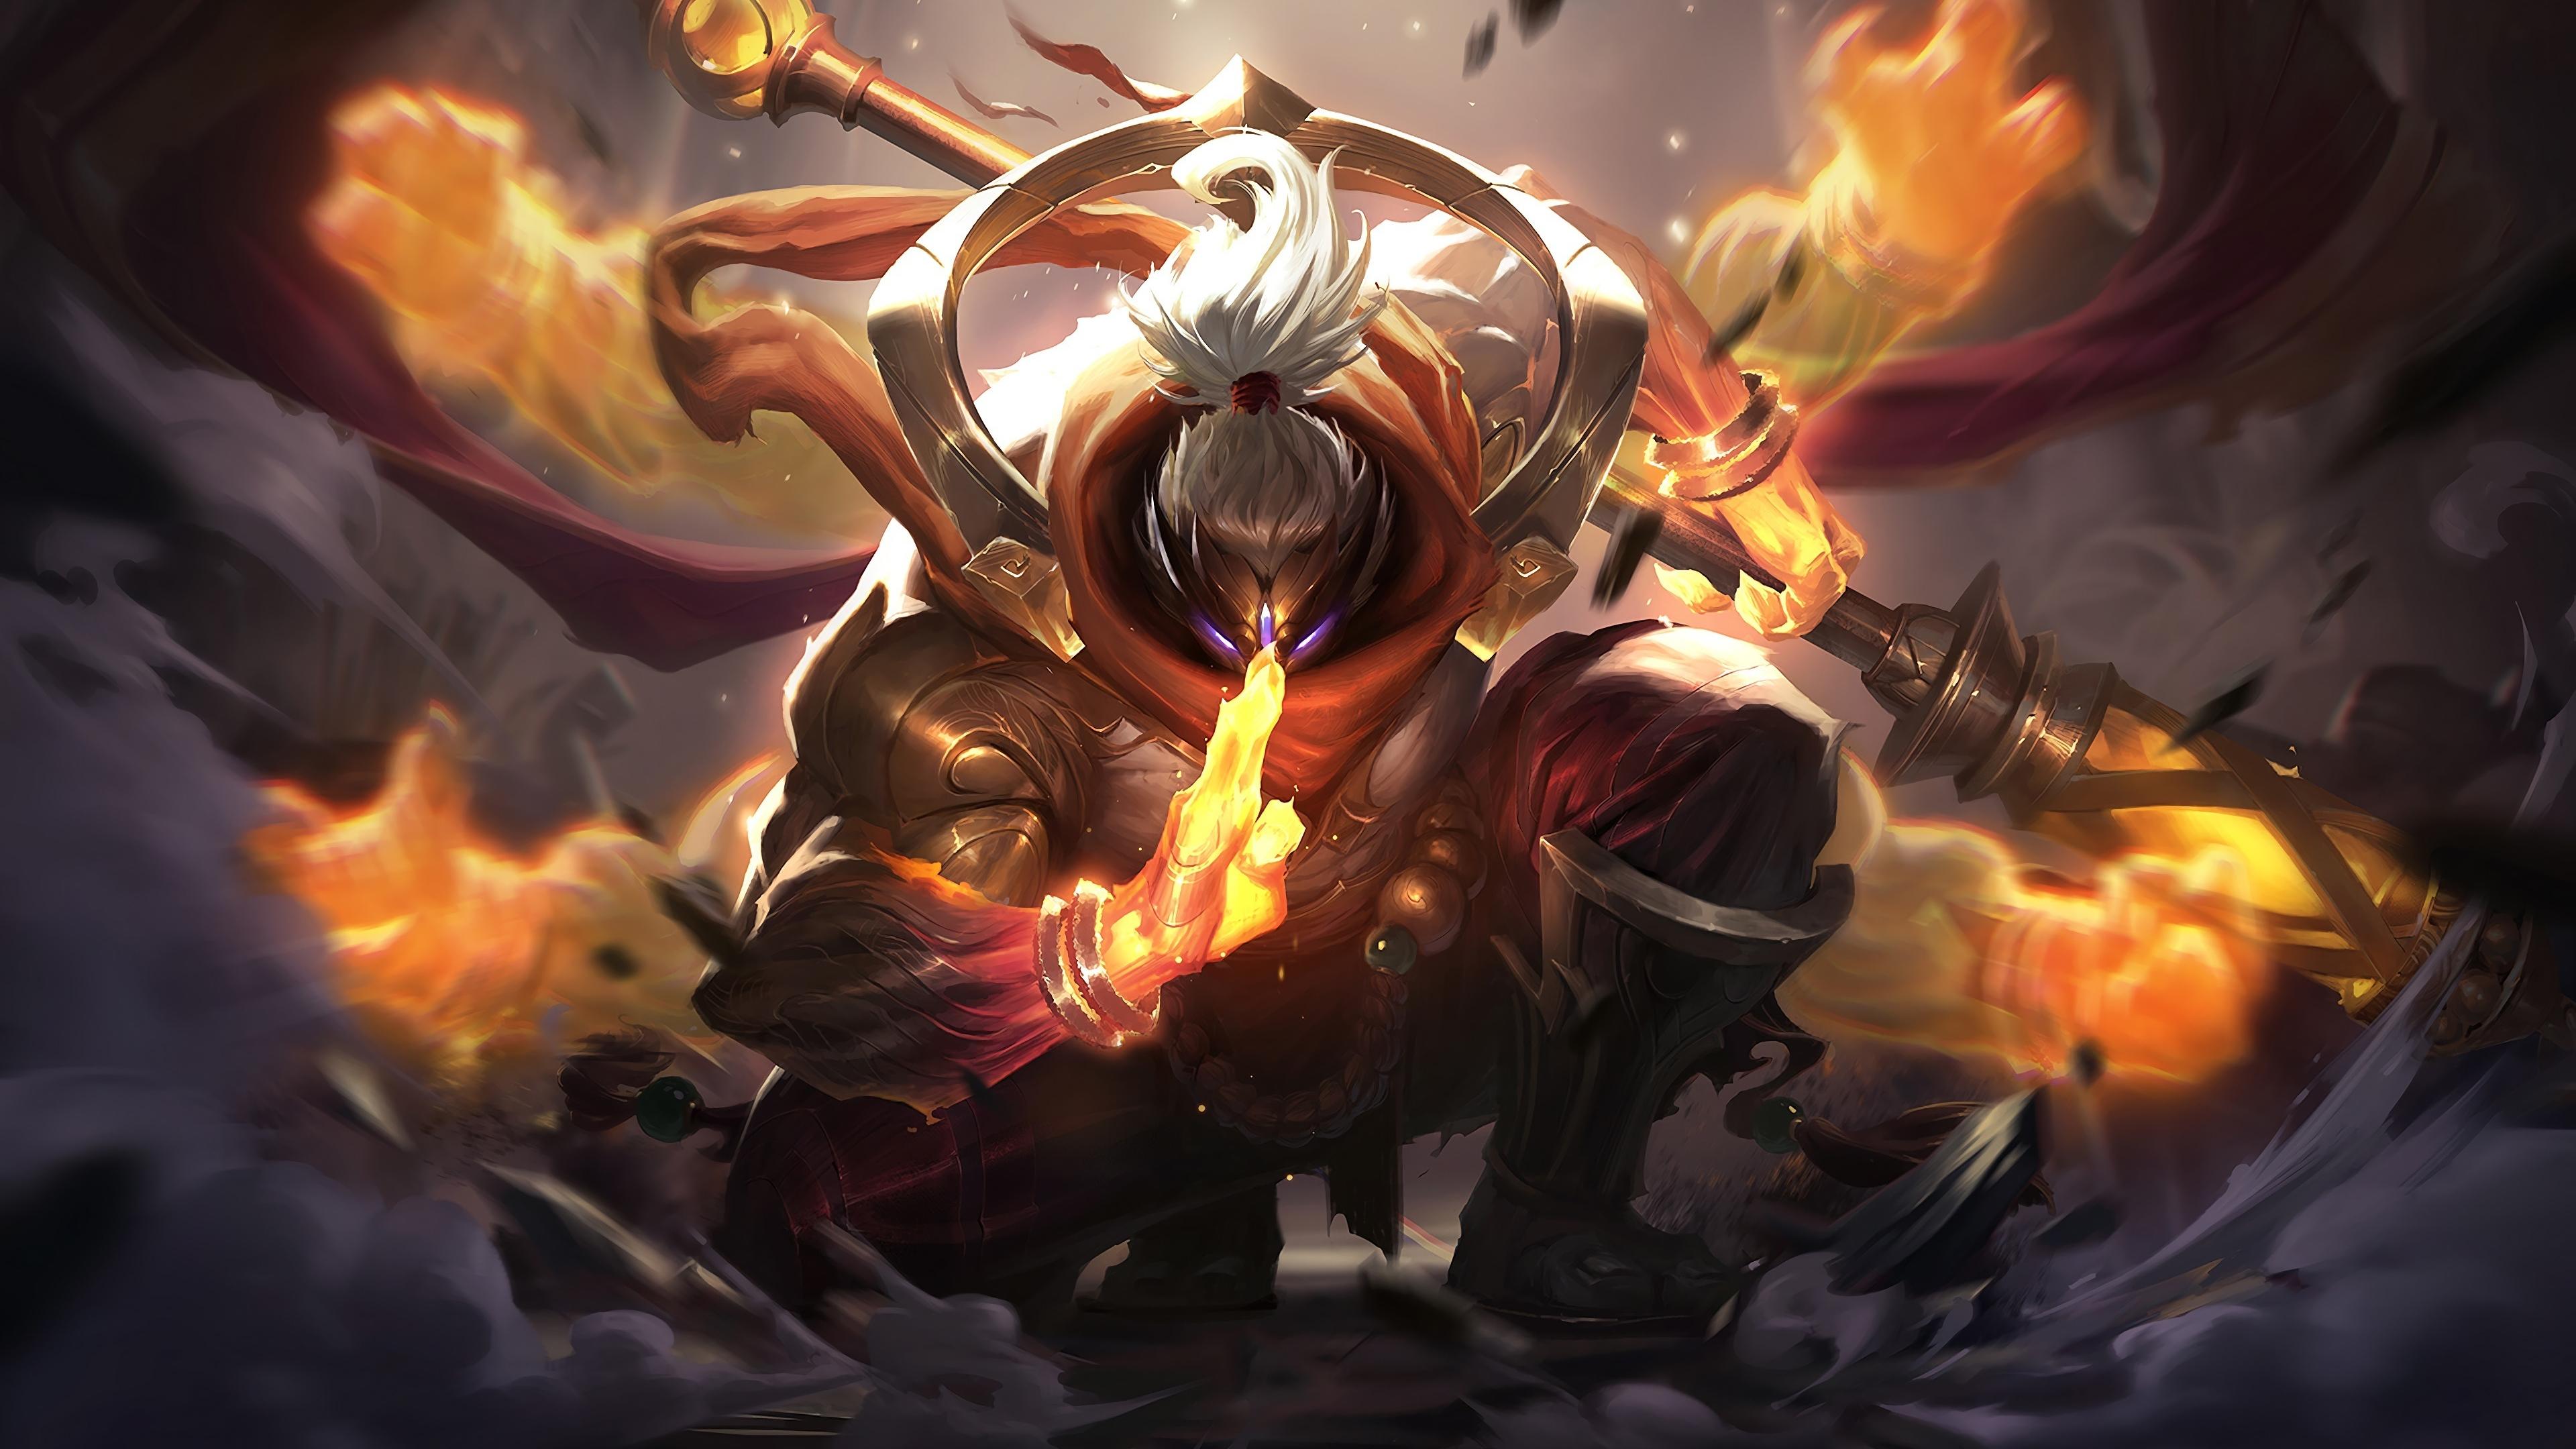 Download 3840x2160 Wallpaper Jax League Of Legends Warrior